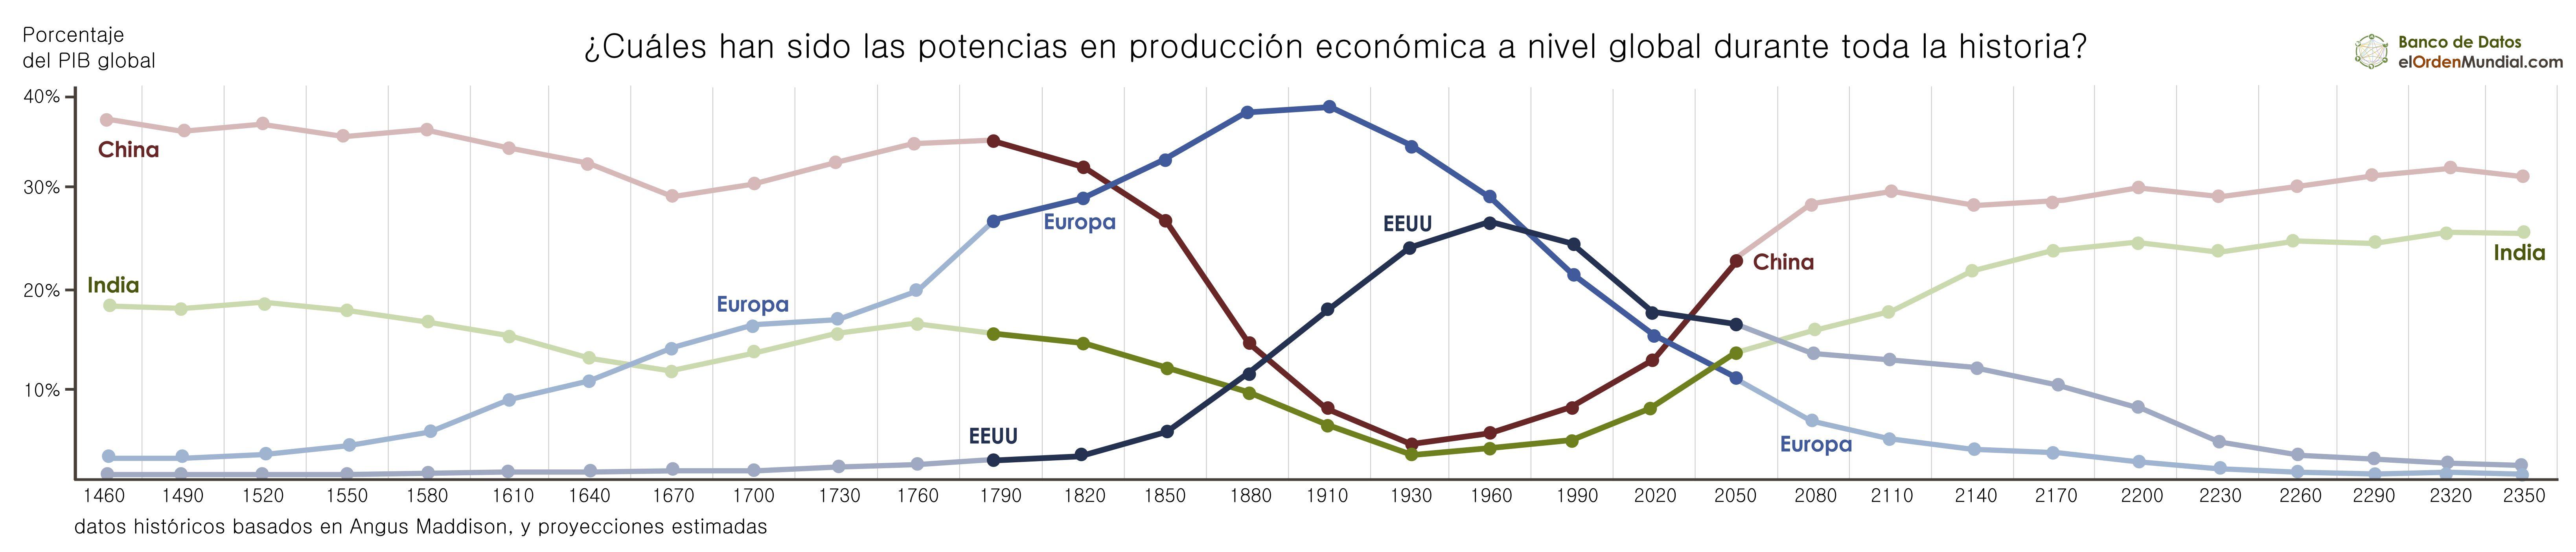 historia-economica